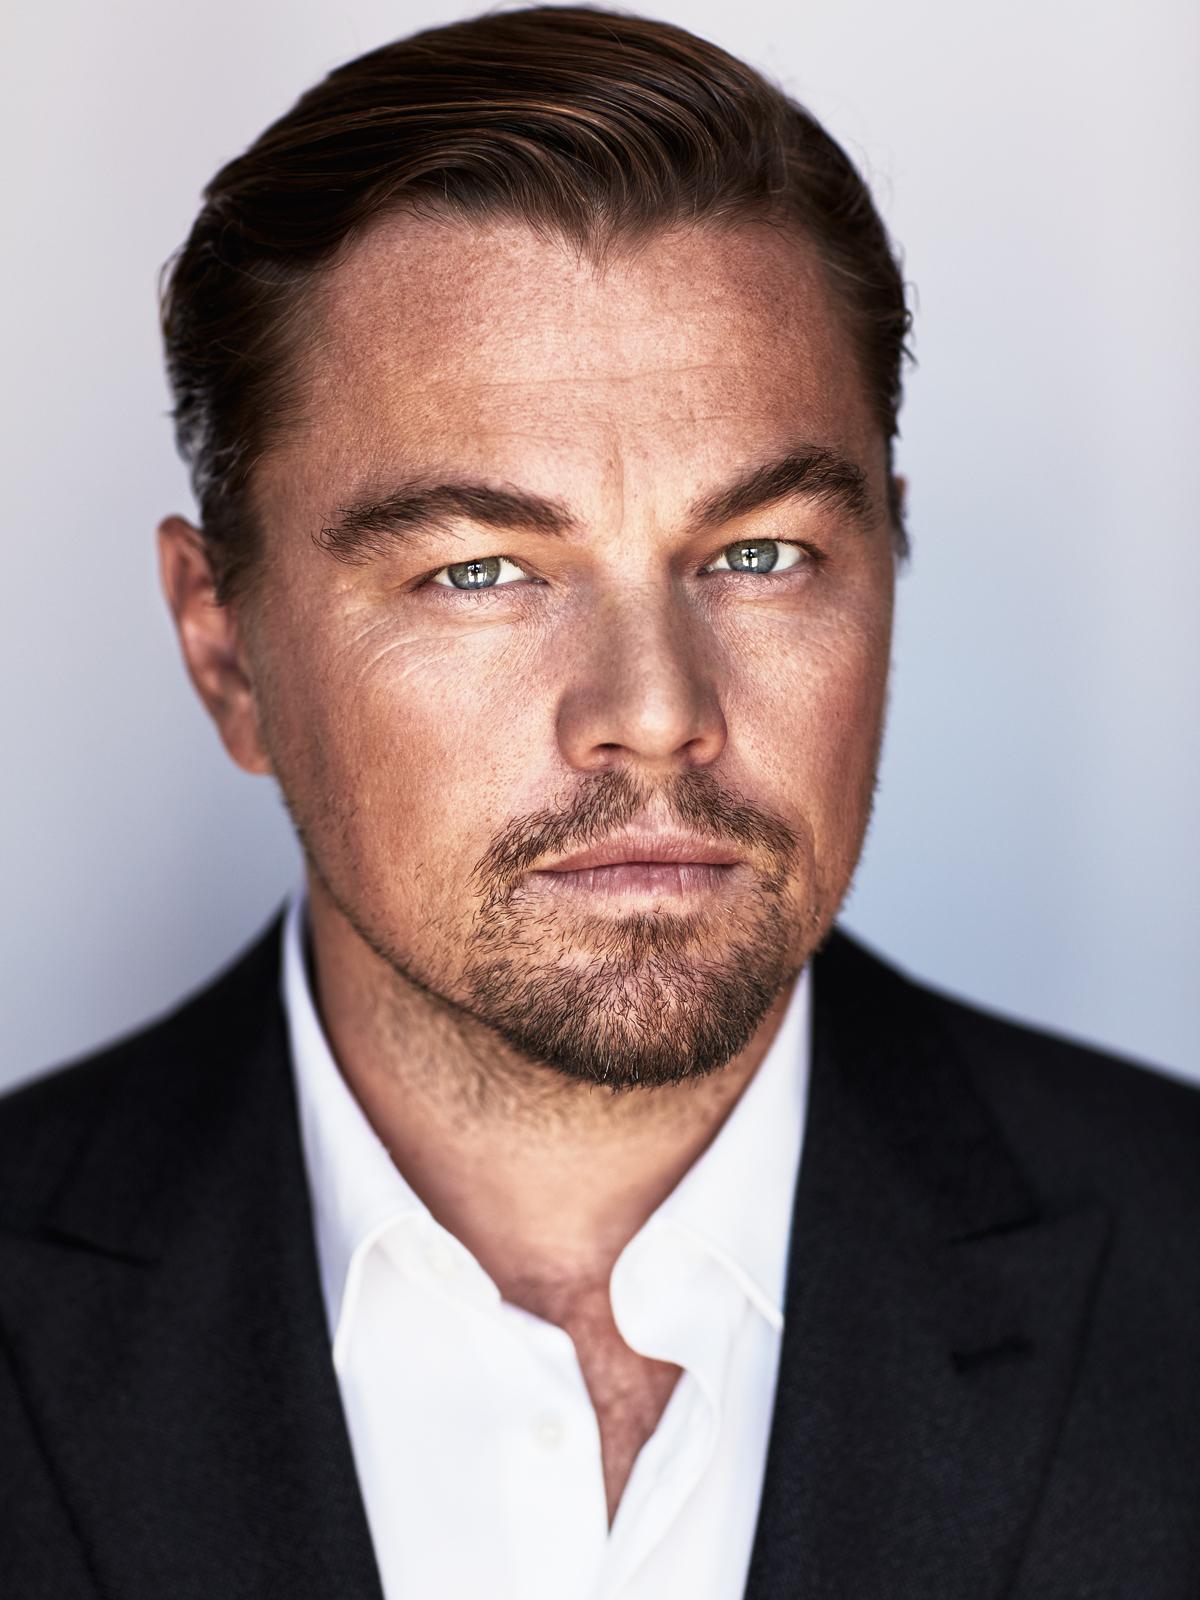 """İsyanım Birikti Sığmaz İçime"" - Leonardo DiCaprio"